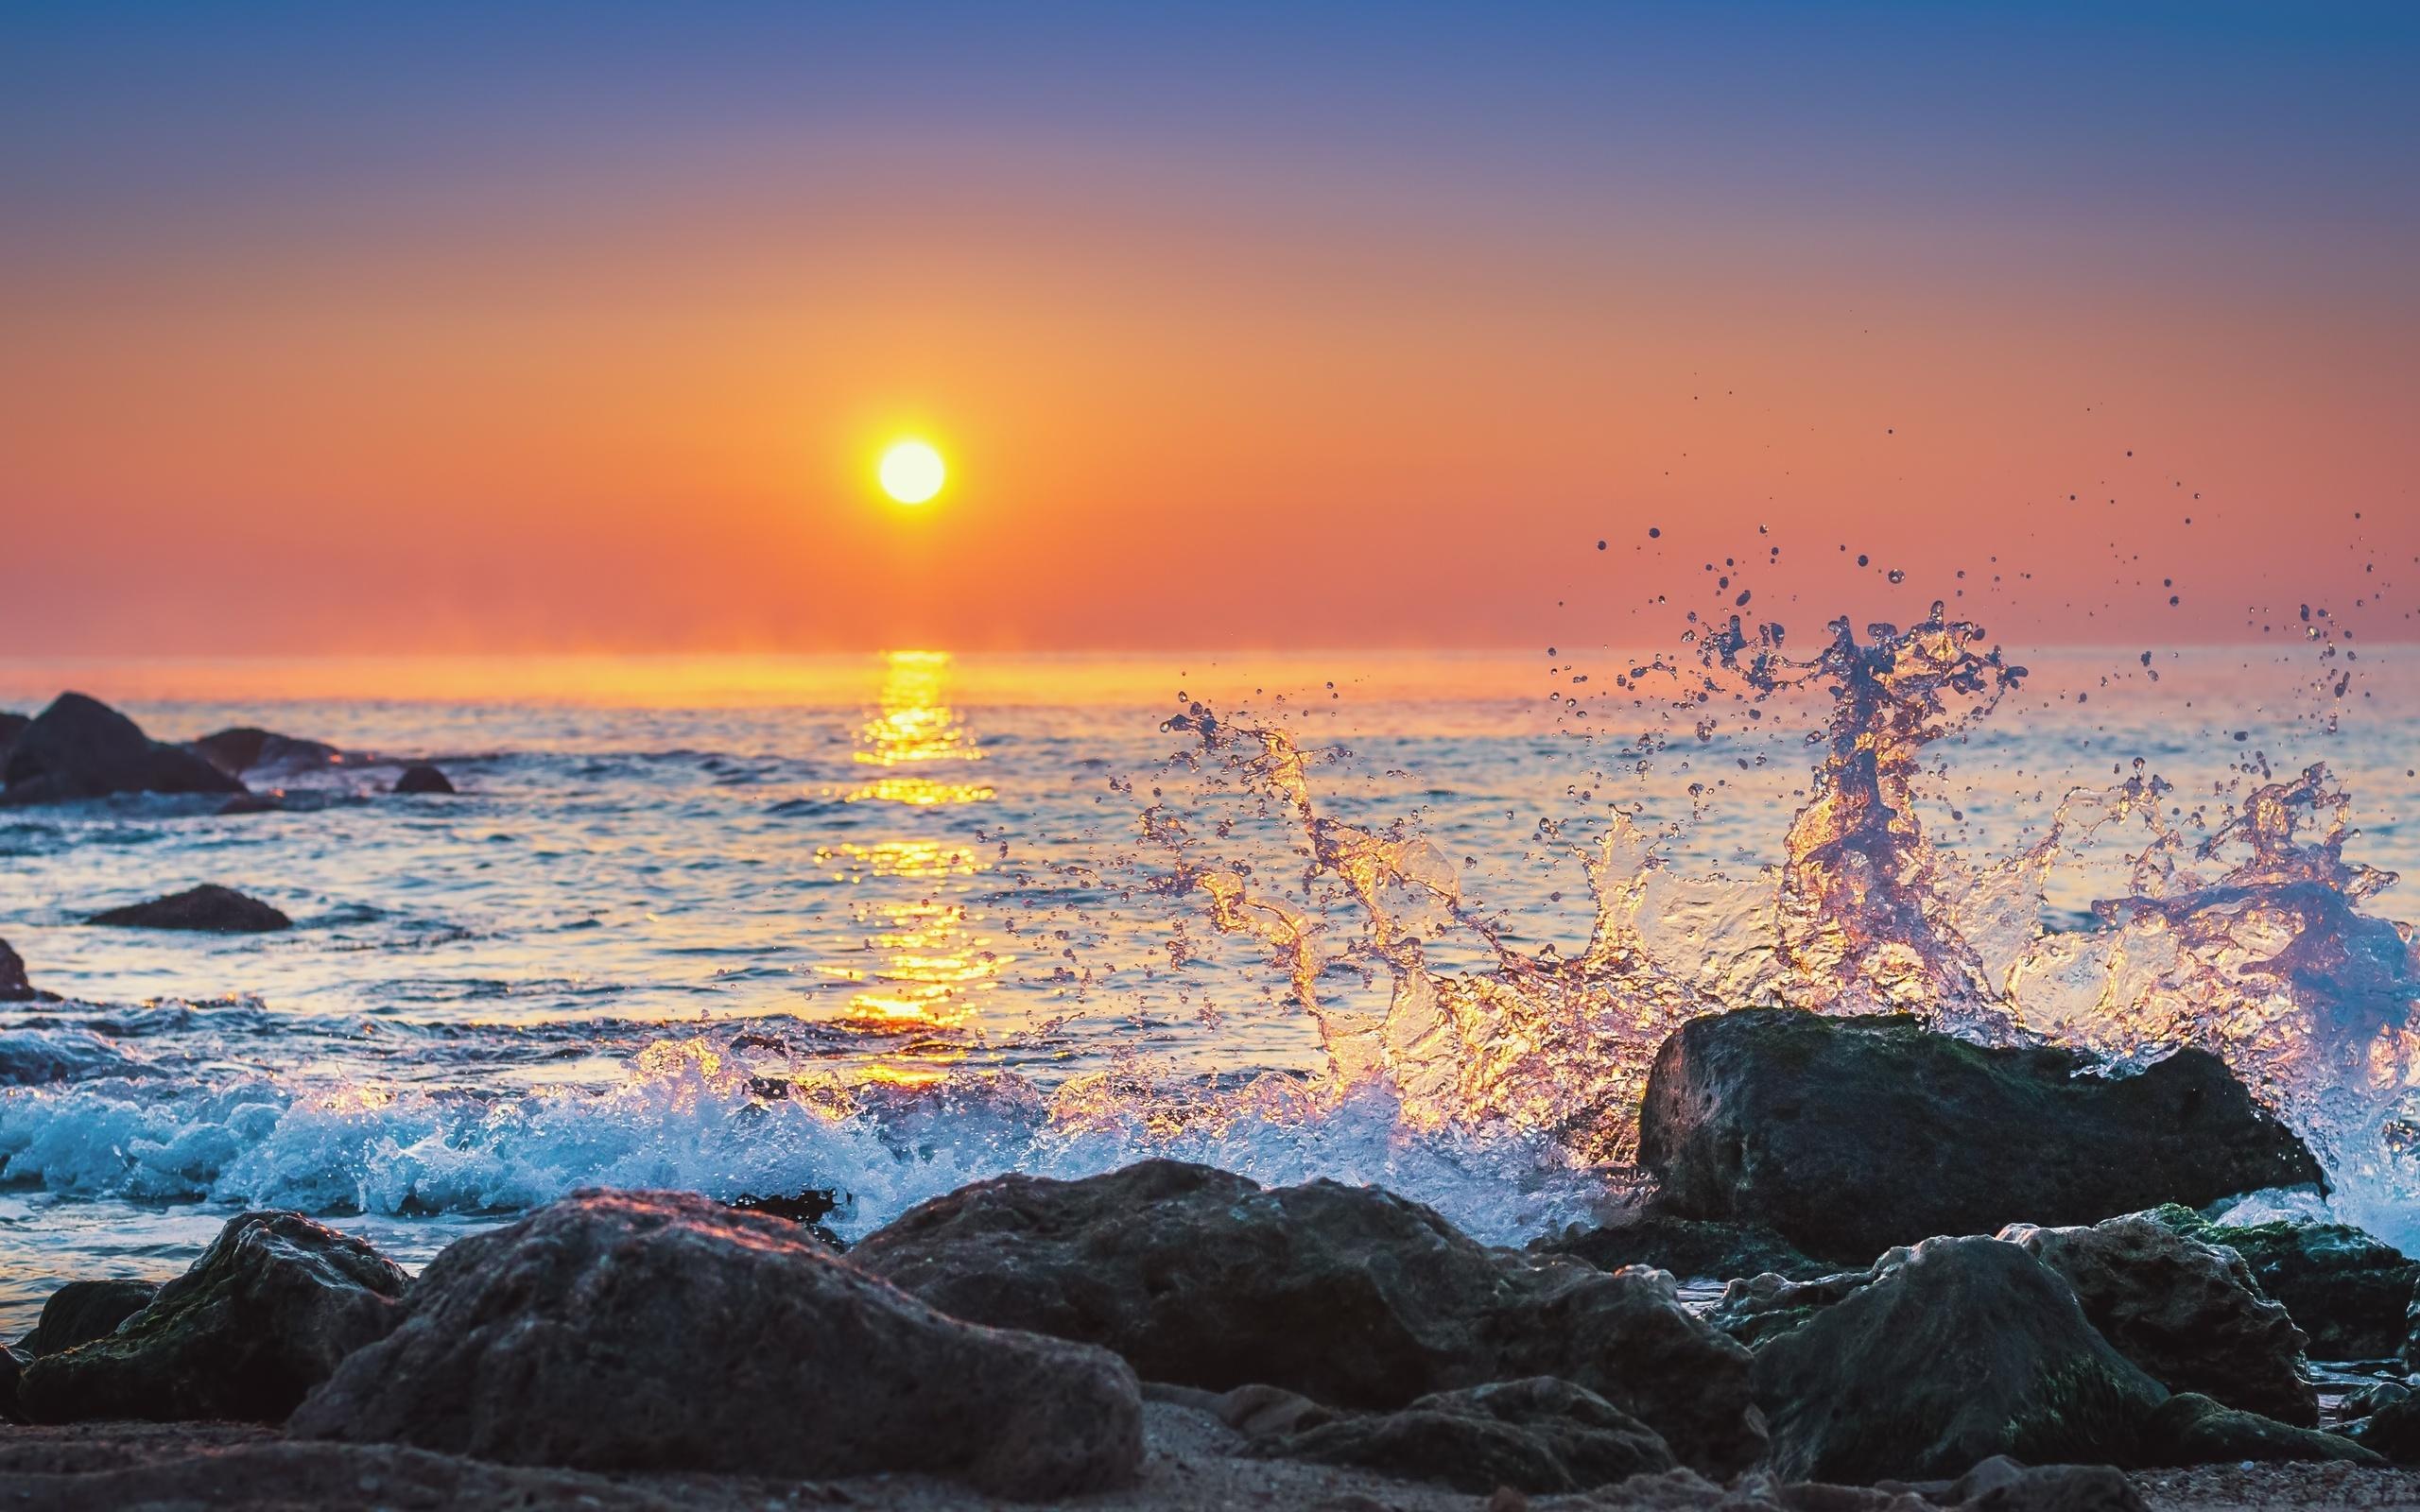 барского рассвет на берегу моря фото включив